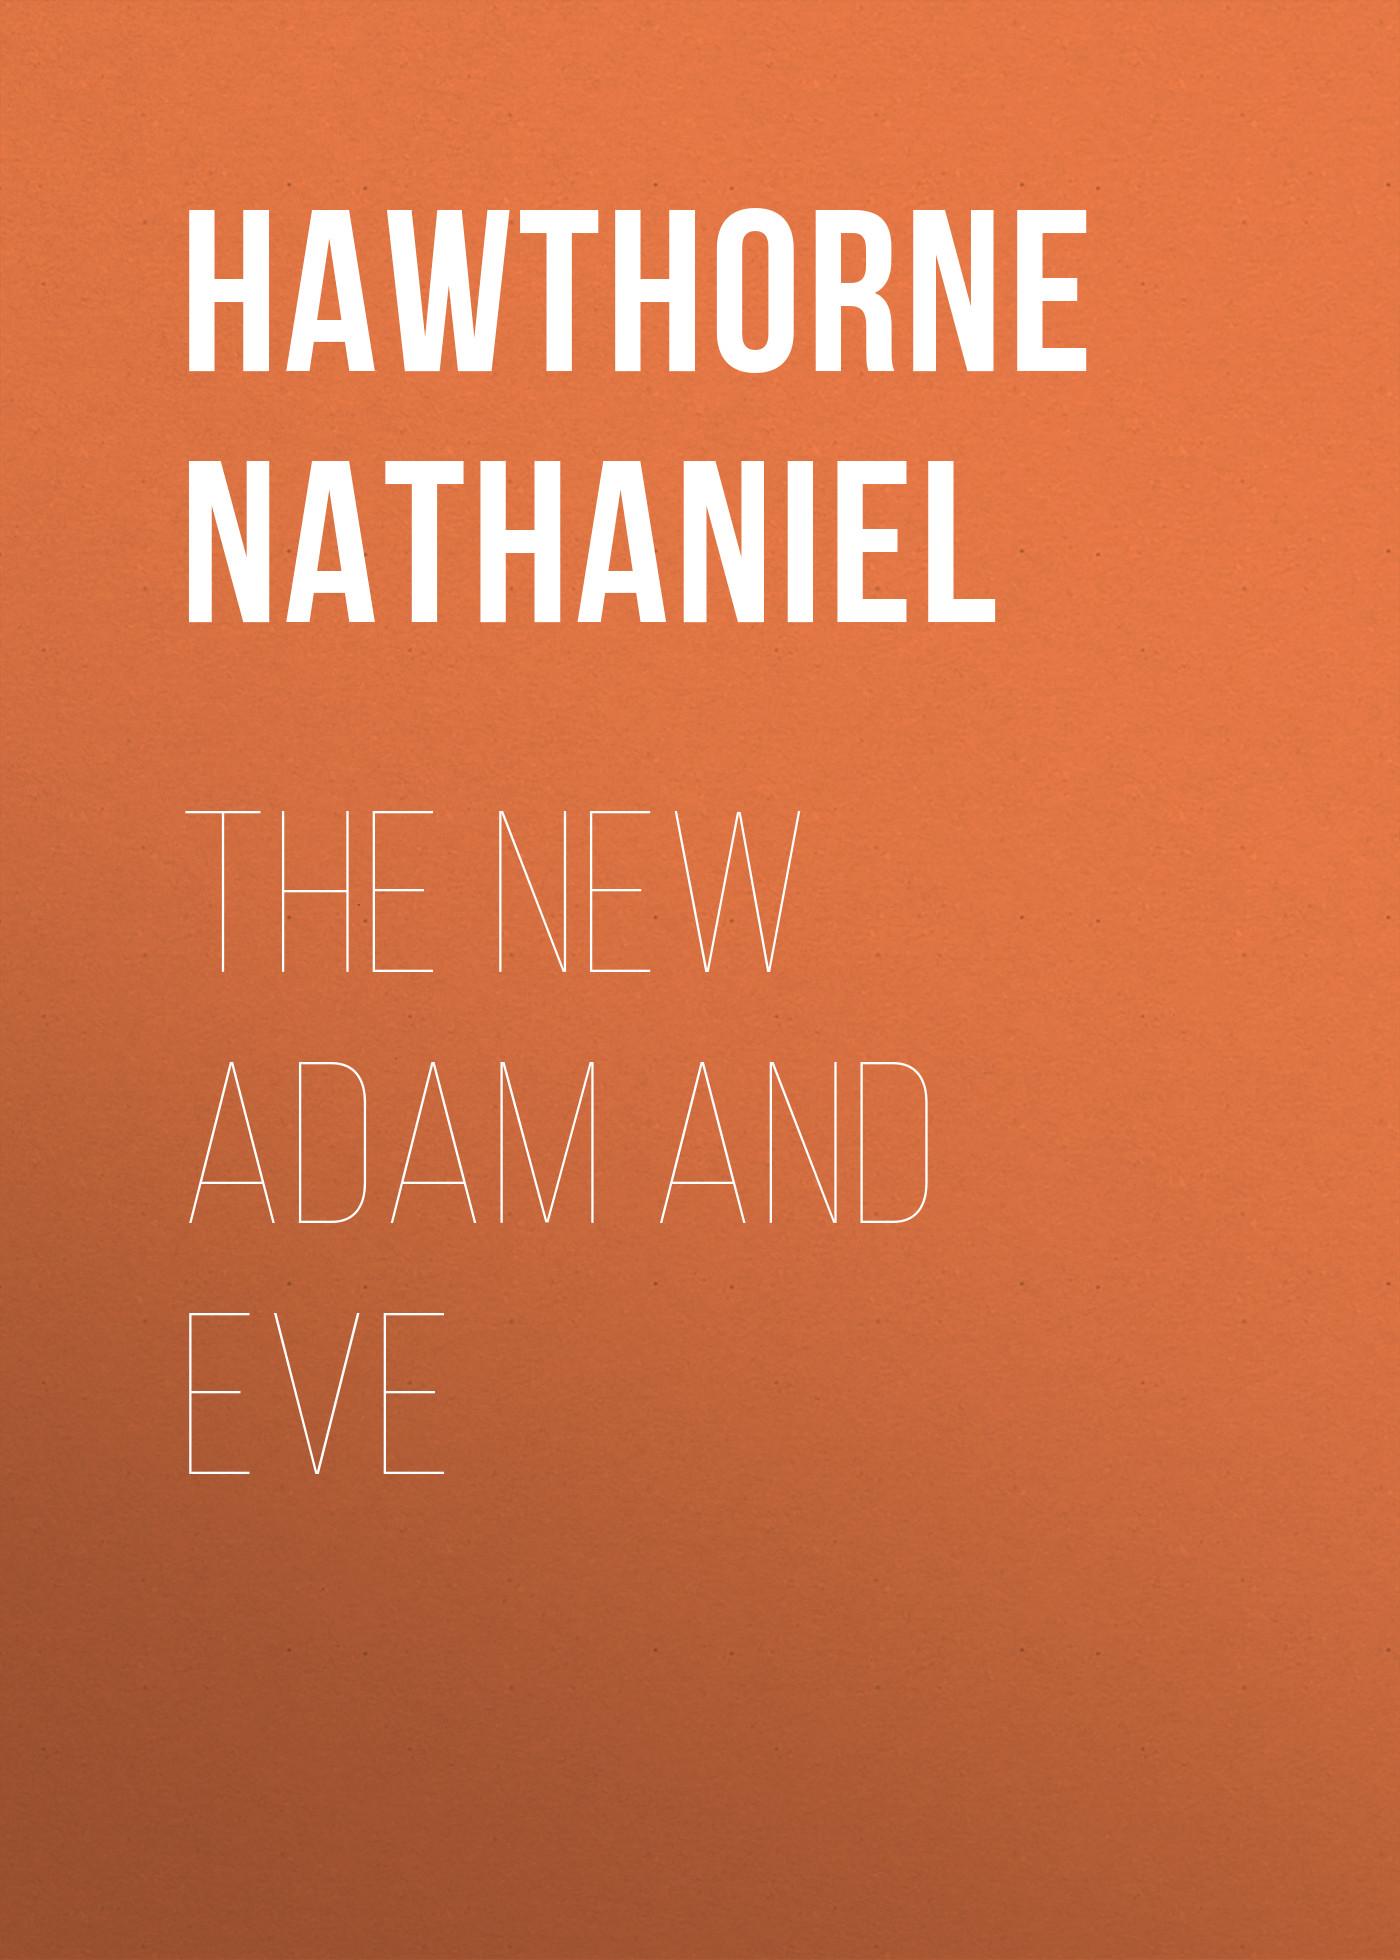 Hawthorne Nathaniel The New Adam and Eve набор столовых приборов vitesse blithe